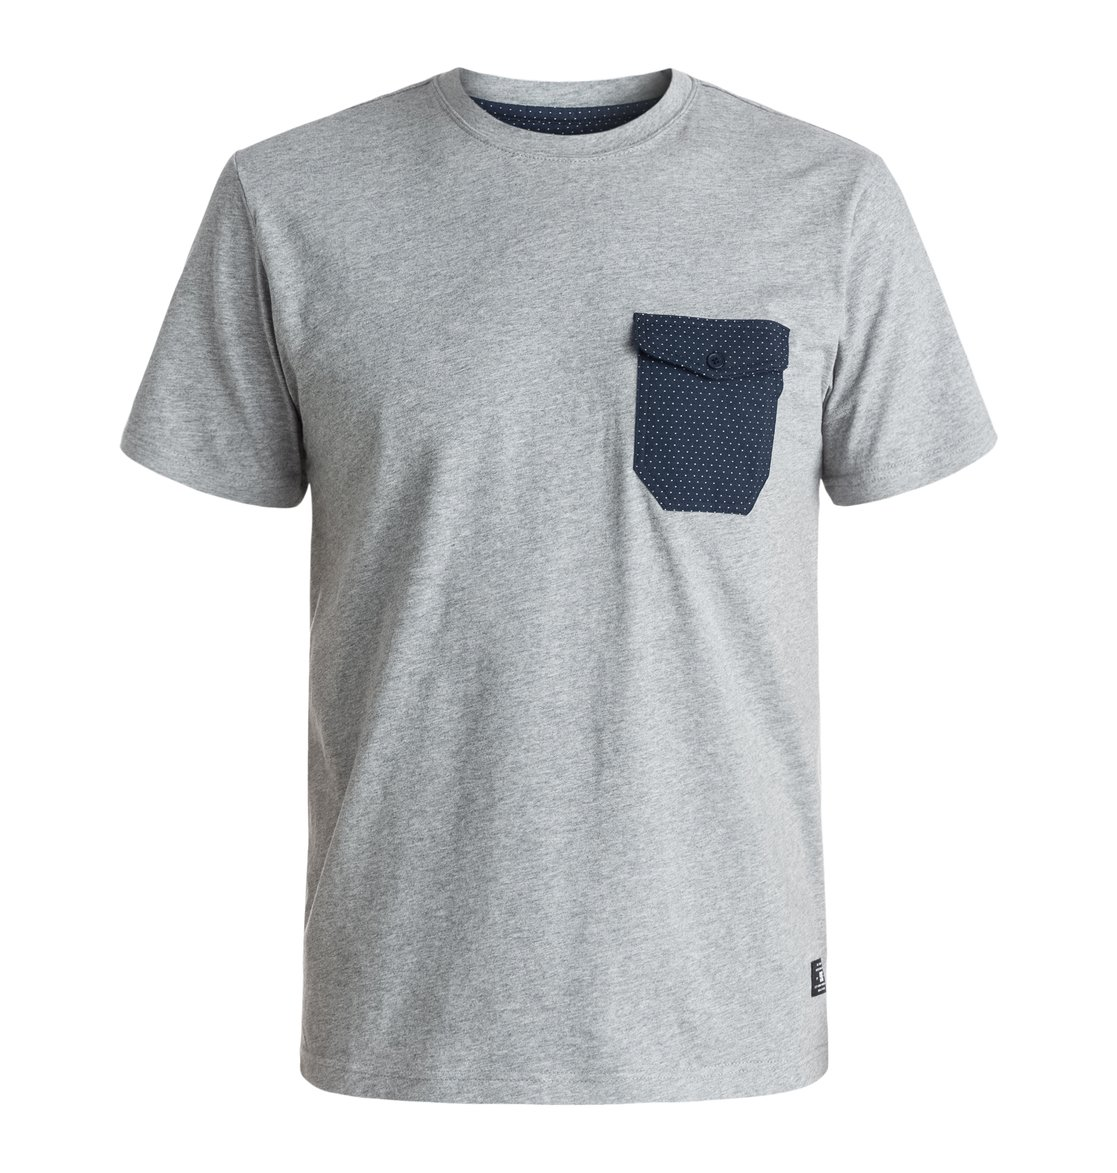 DC-Shoes-Hailey-Morris-Tee-Shirt-a-poche-pour-homme-EDYKT03293